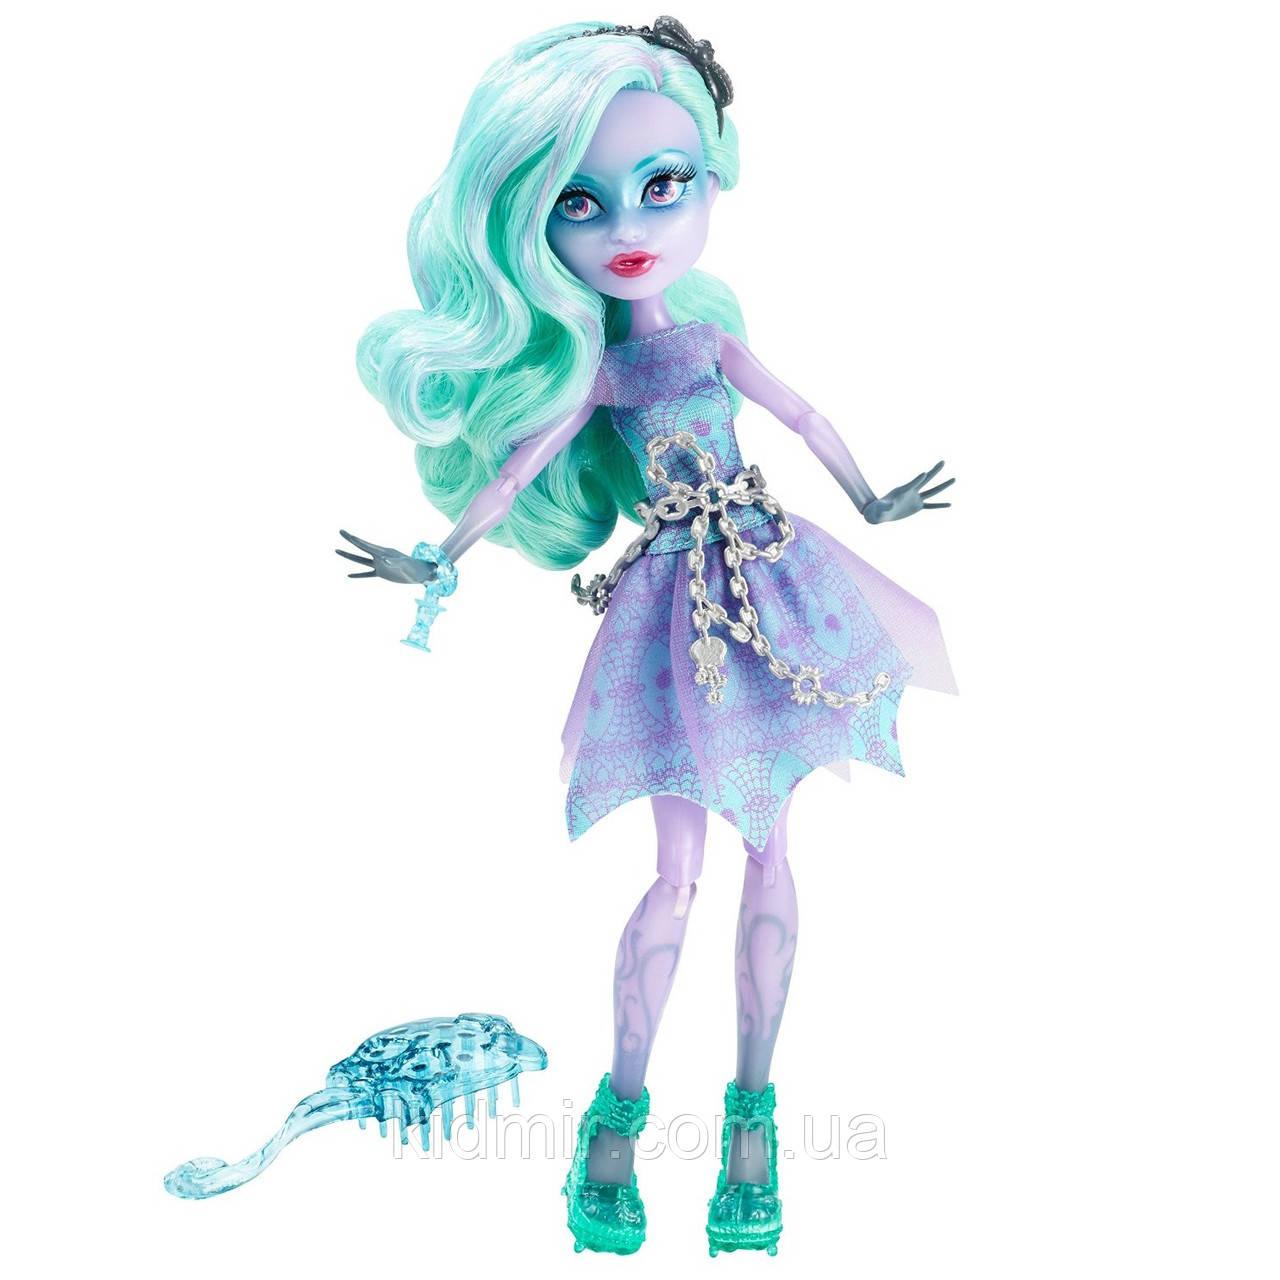 Лялька Monster High Твайла (Twyla) з серії Haunted Getting Ghostly Монстр Хай